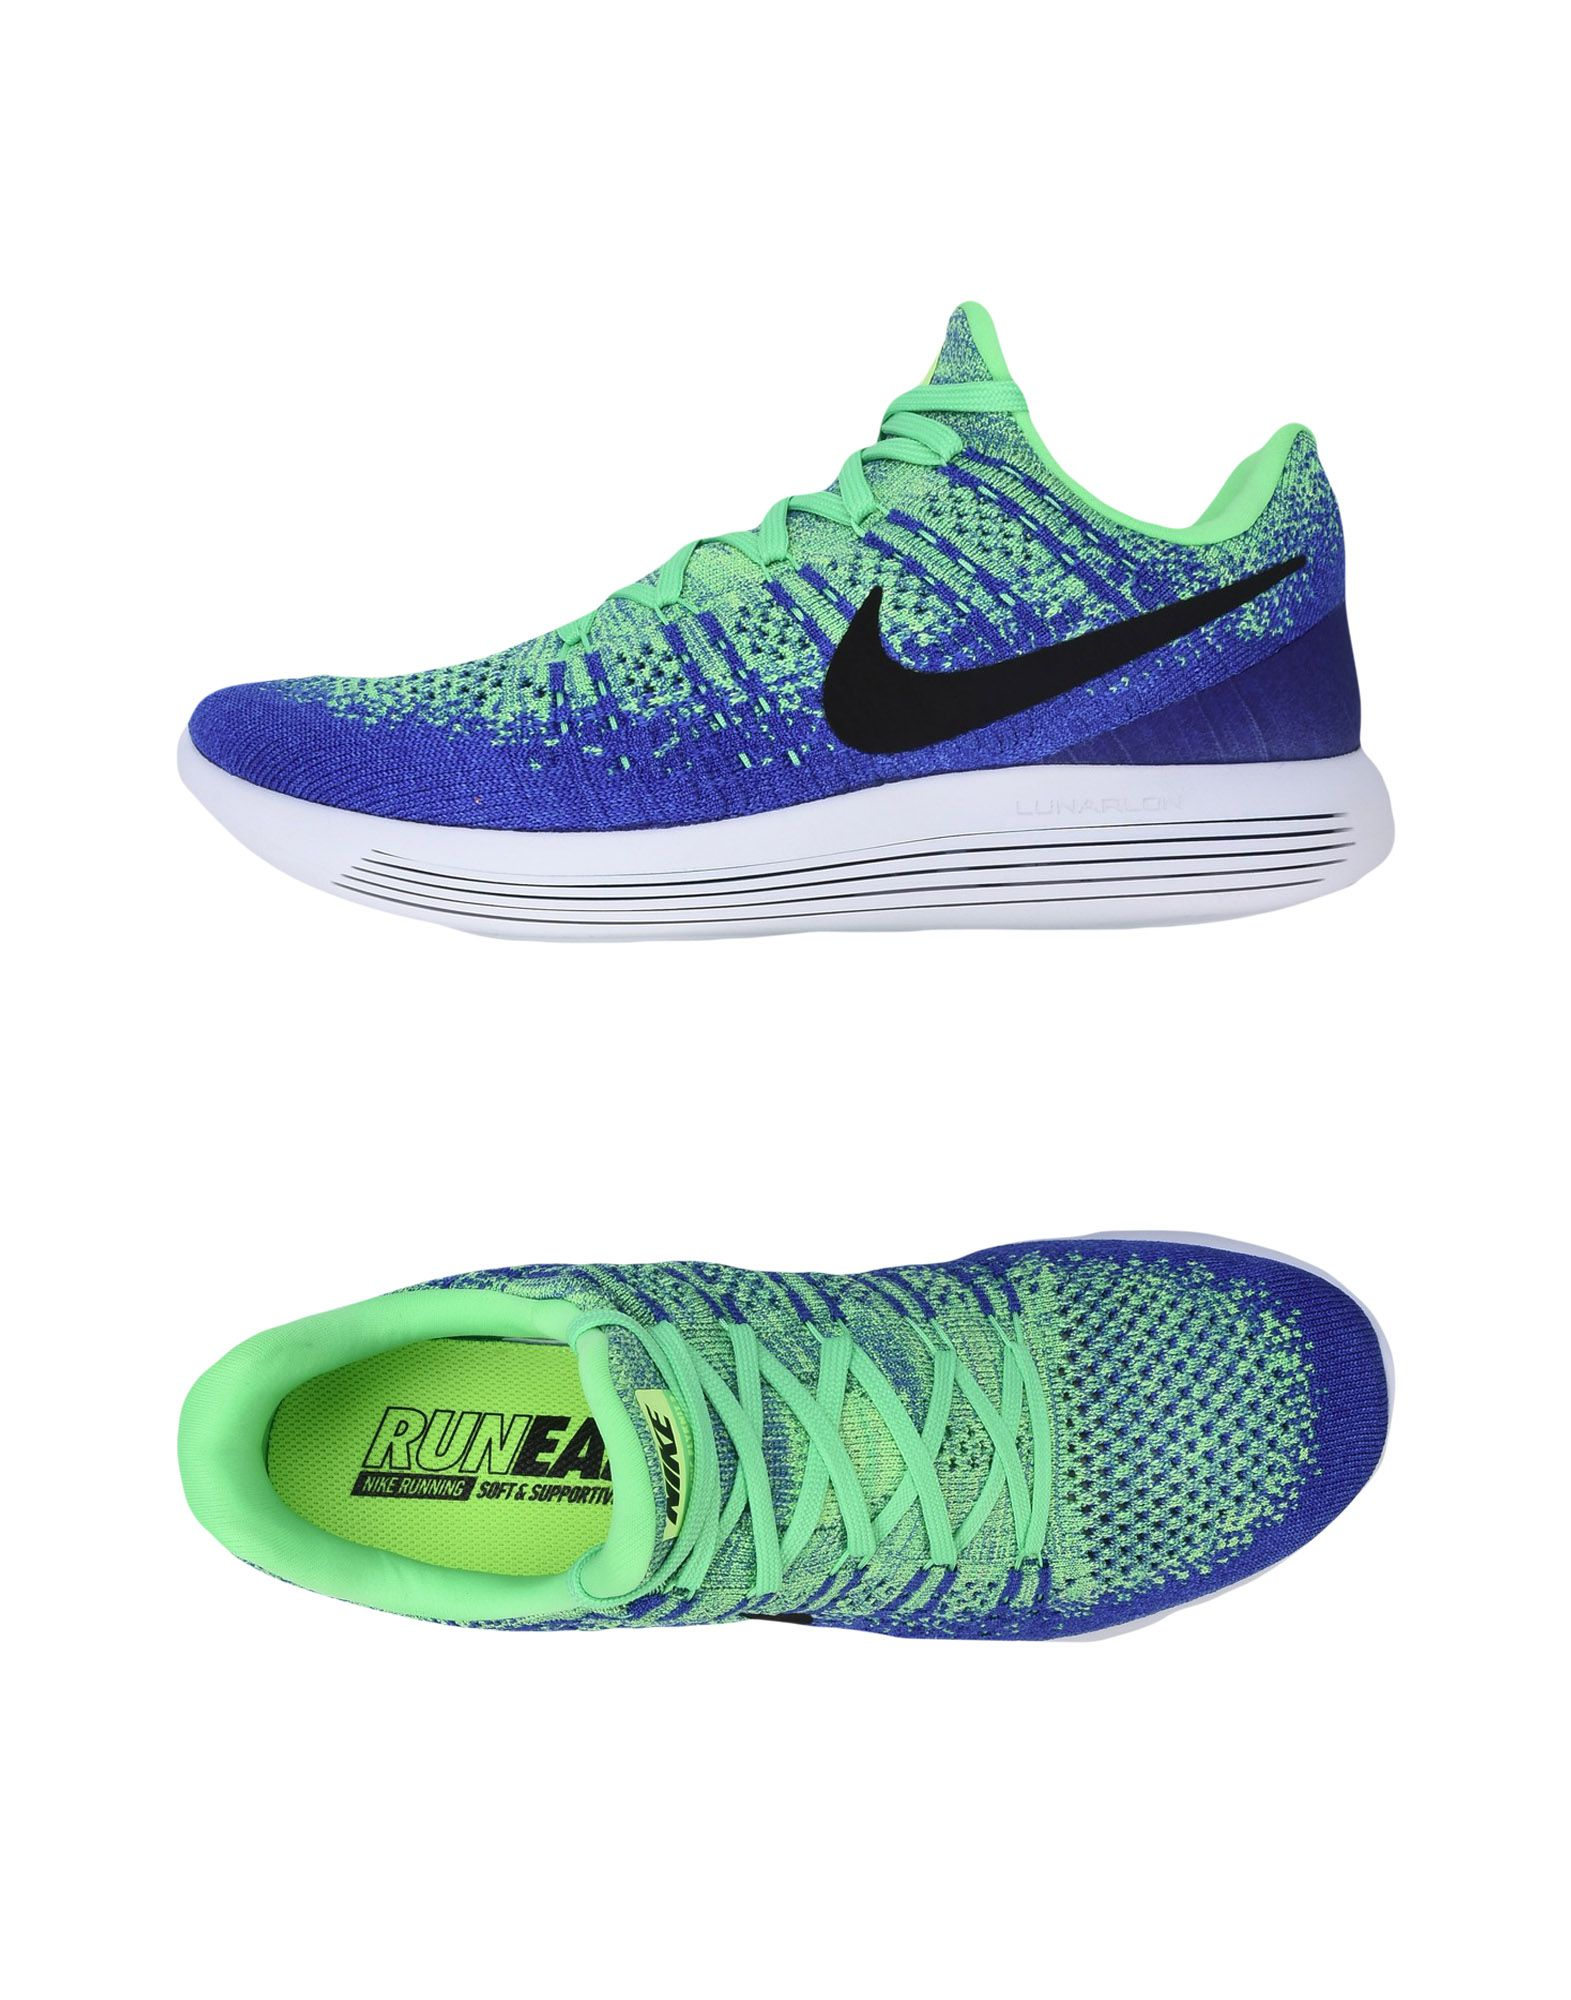 Sneakers Nike  Lunarepic Low Flyknit 2 - Uomo - Acquista online su